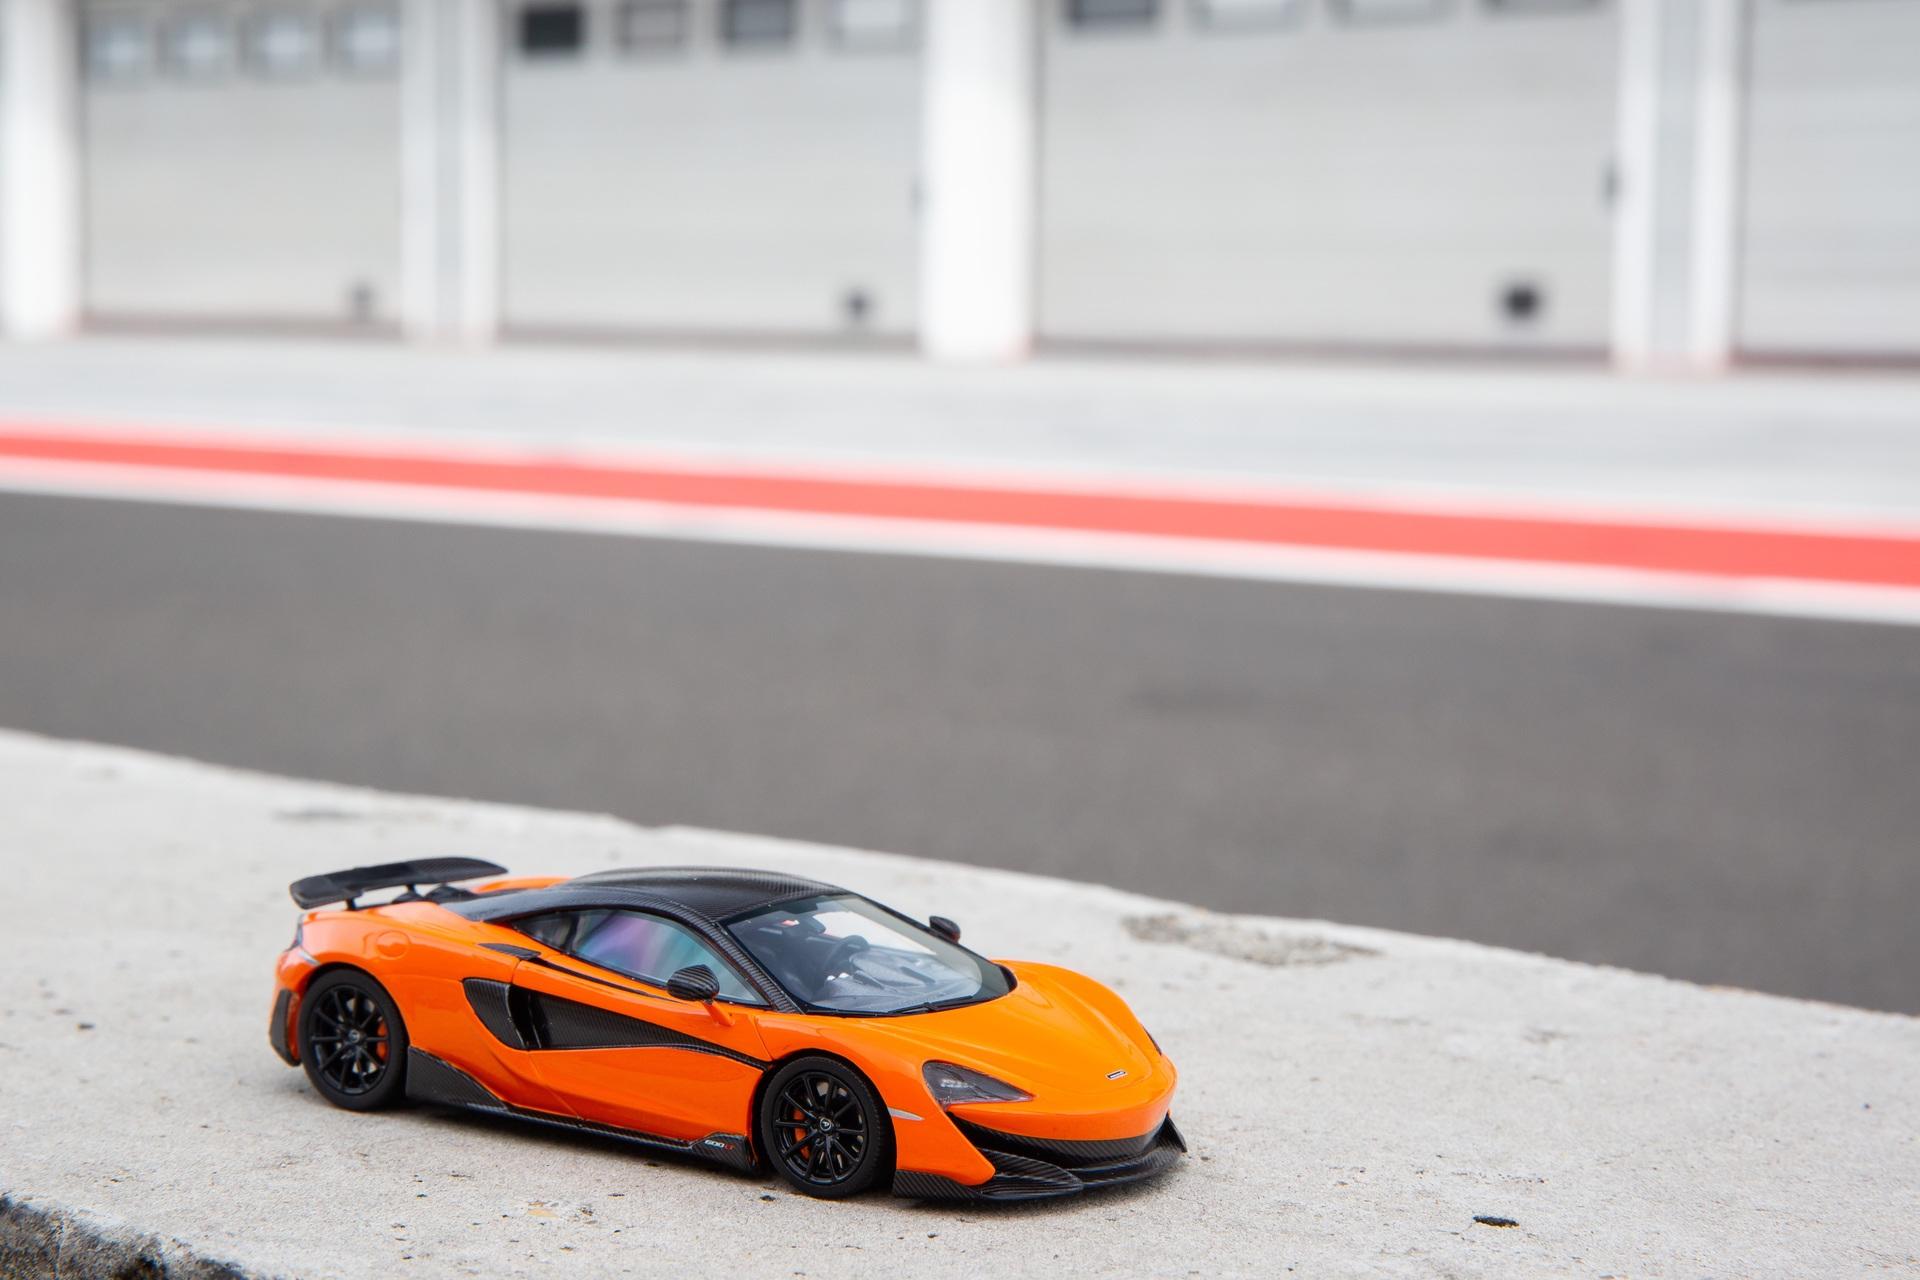 McLaren_600LT_miniature_0001